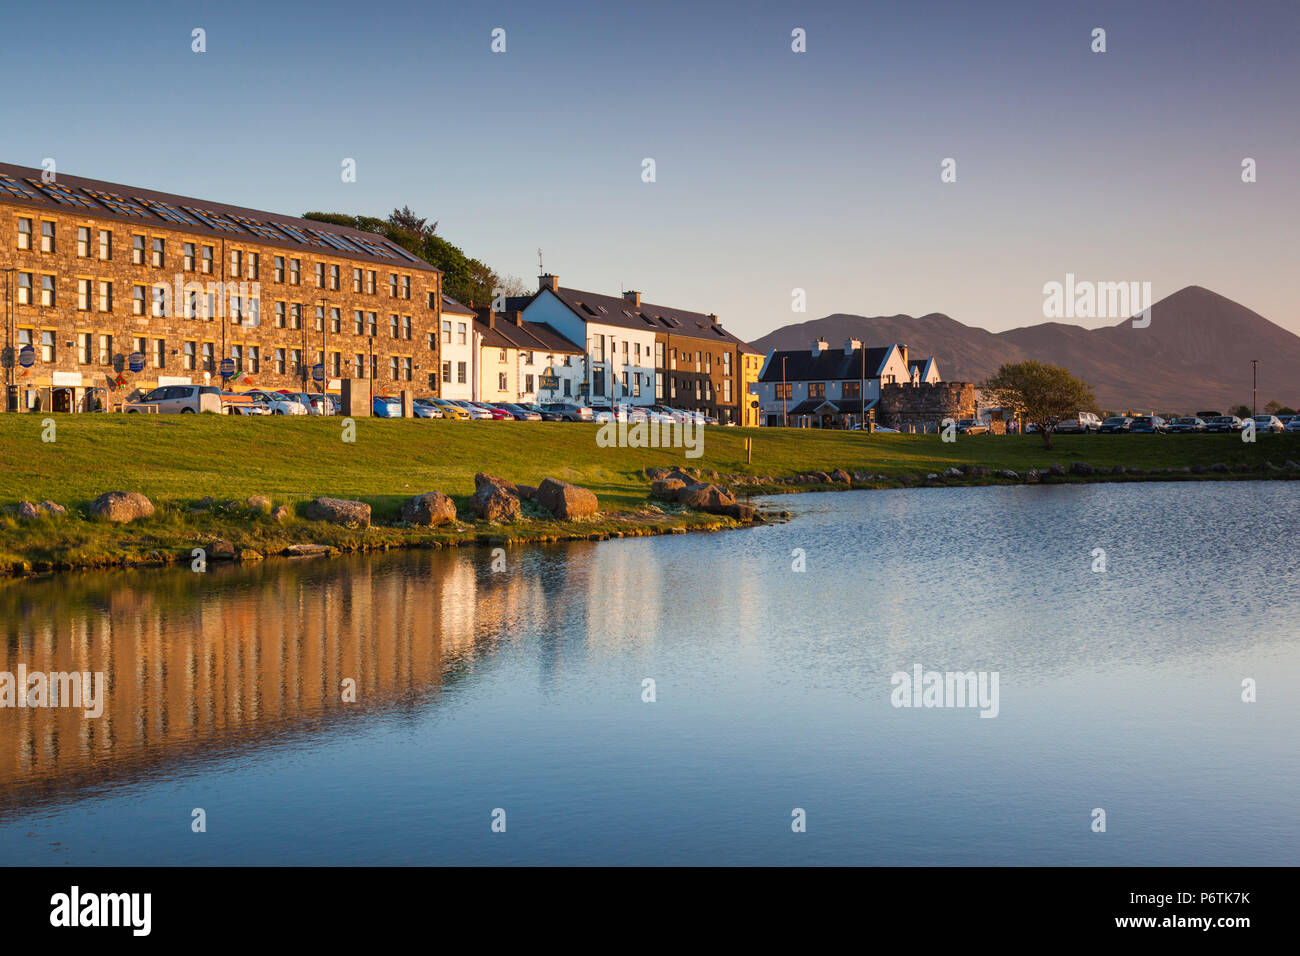 Ireland, County Mayo, Westport Quay, harborfront buildings - Stock Image